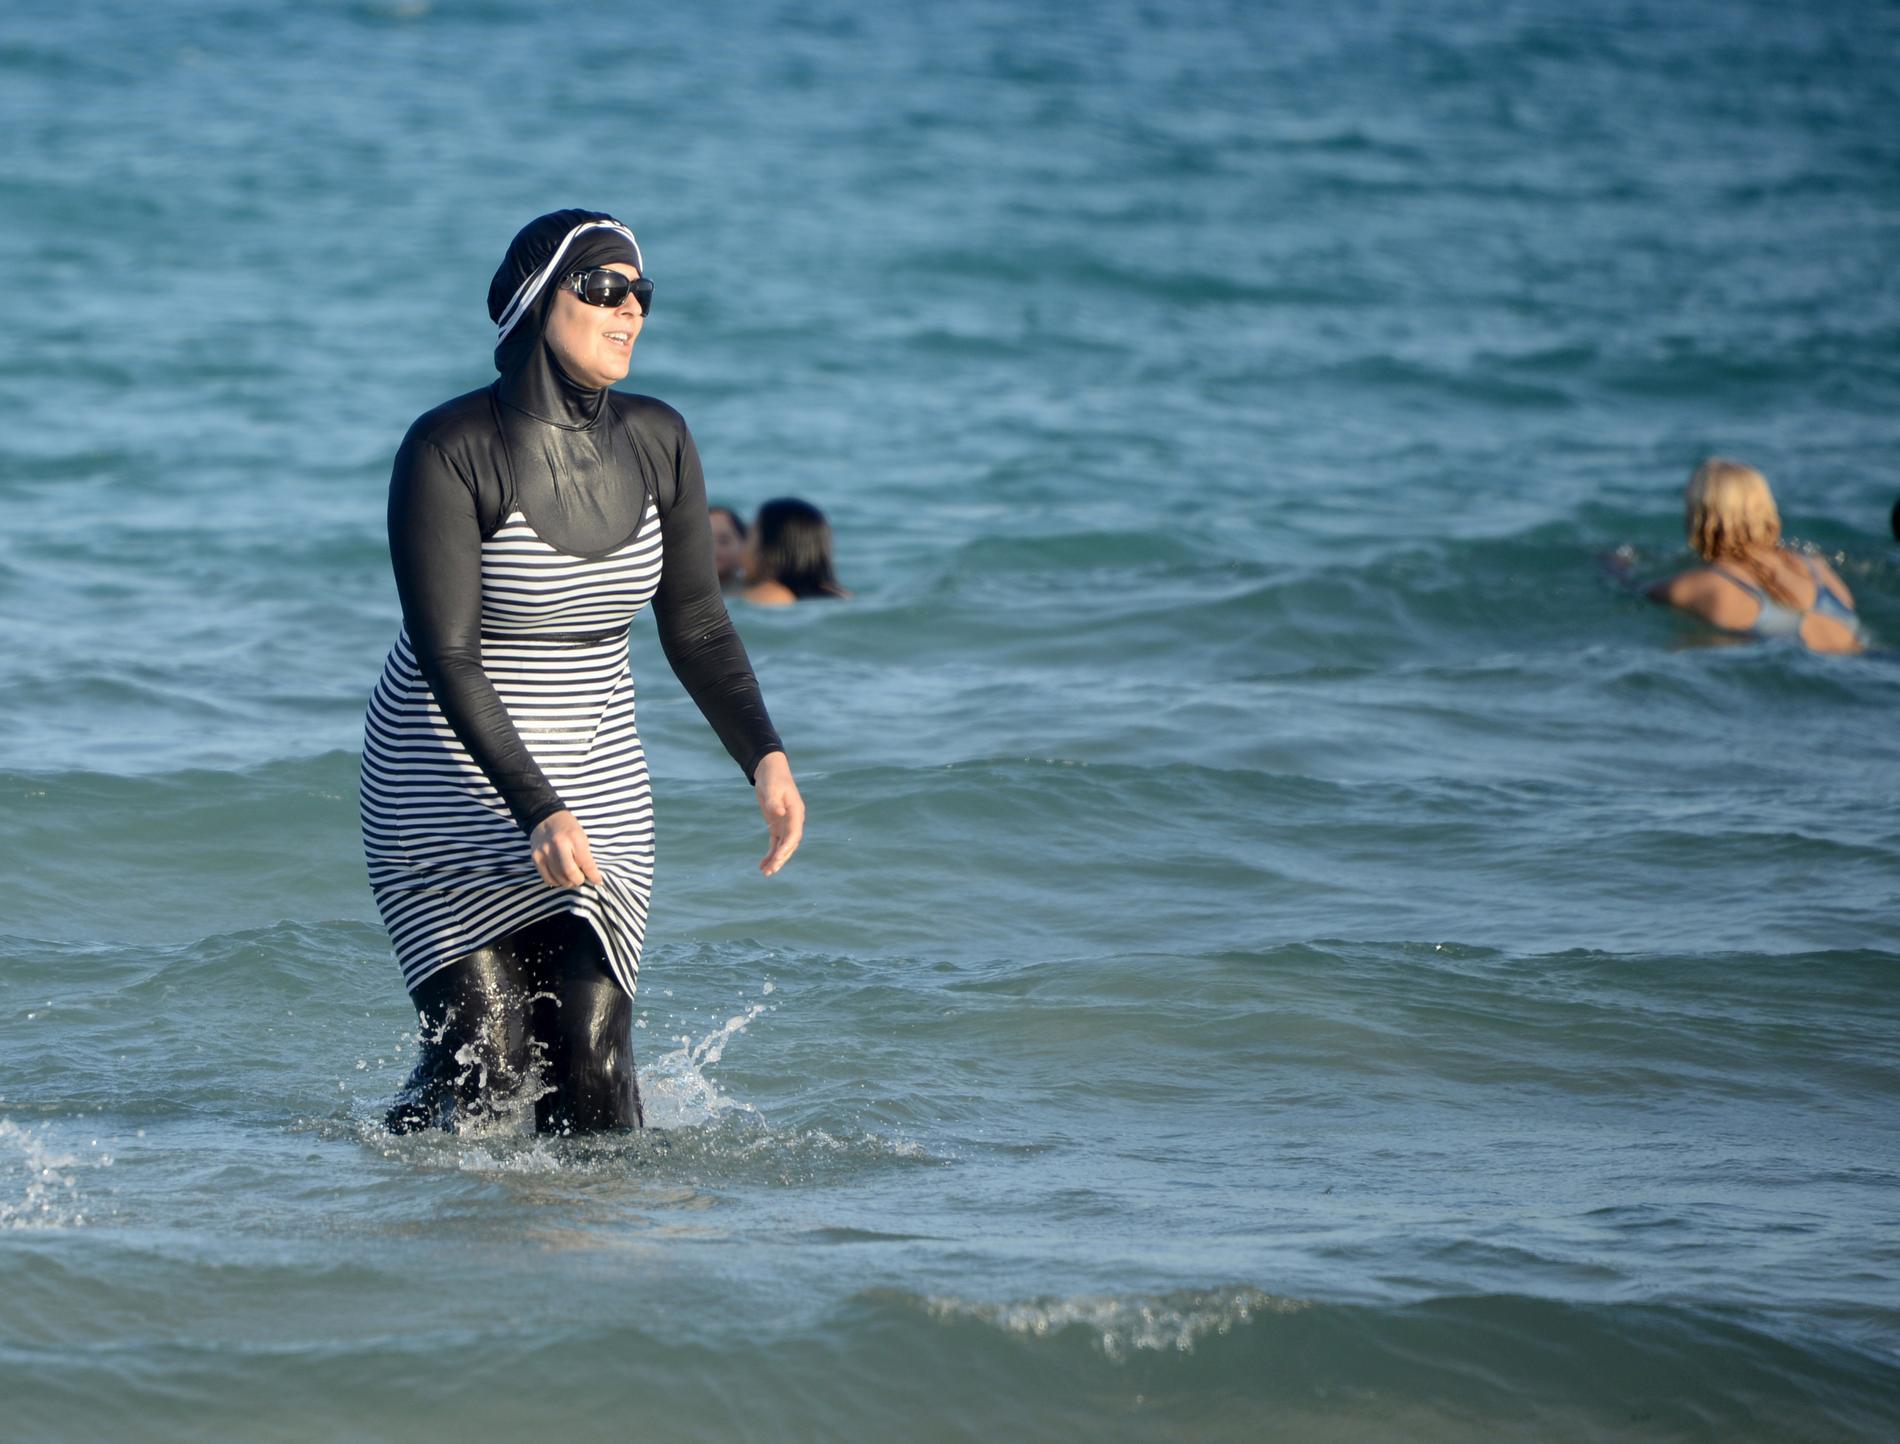 stinson beach single muslim girls Hoka stinson 3 atr women's trail the stinson  hoka one one men's stinson 3 atr by hoka one one  bolinas and stinson beach (ca) (images of america) dec 1, 2004.